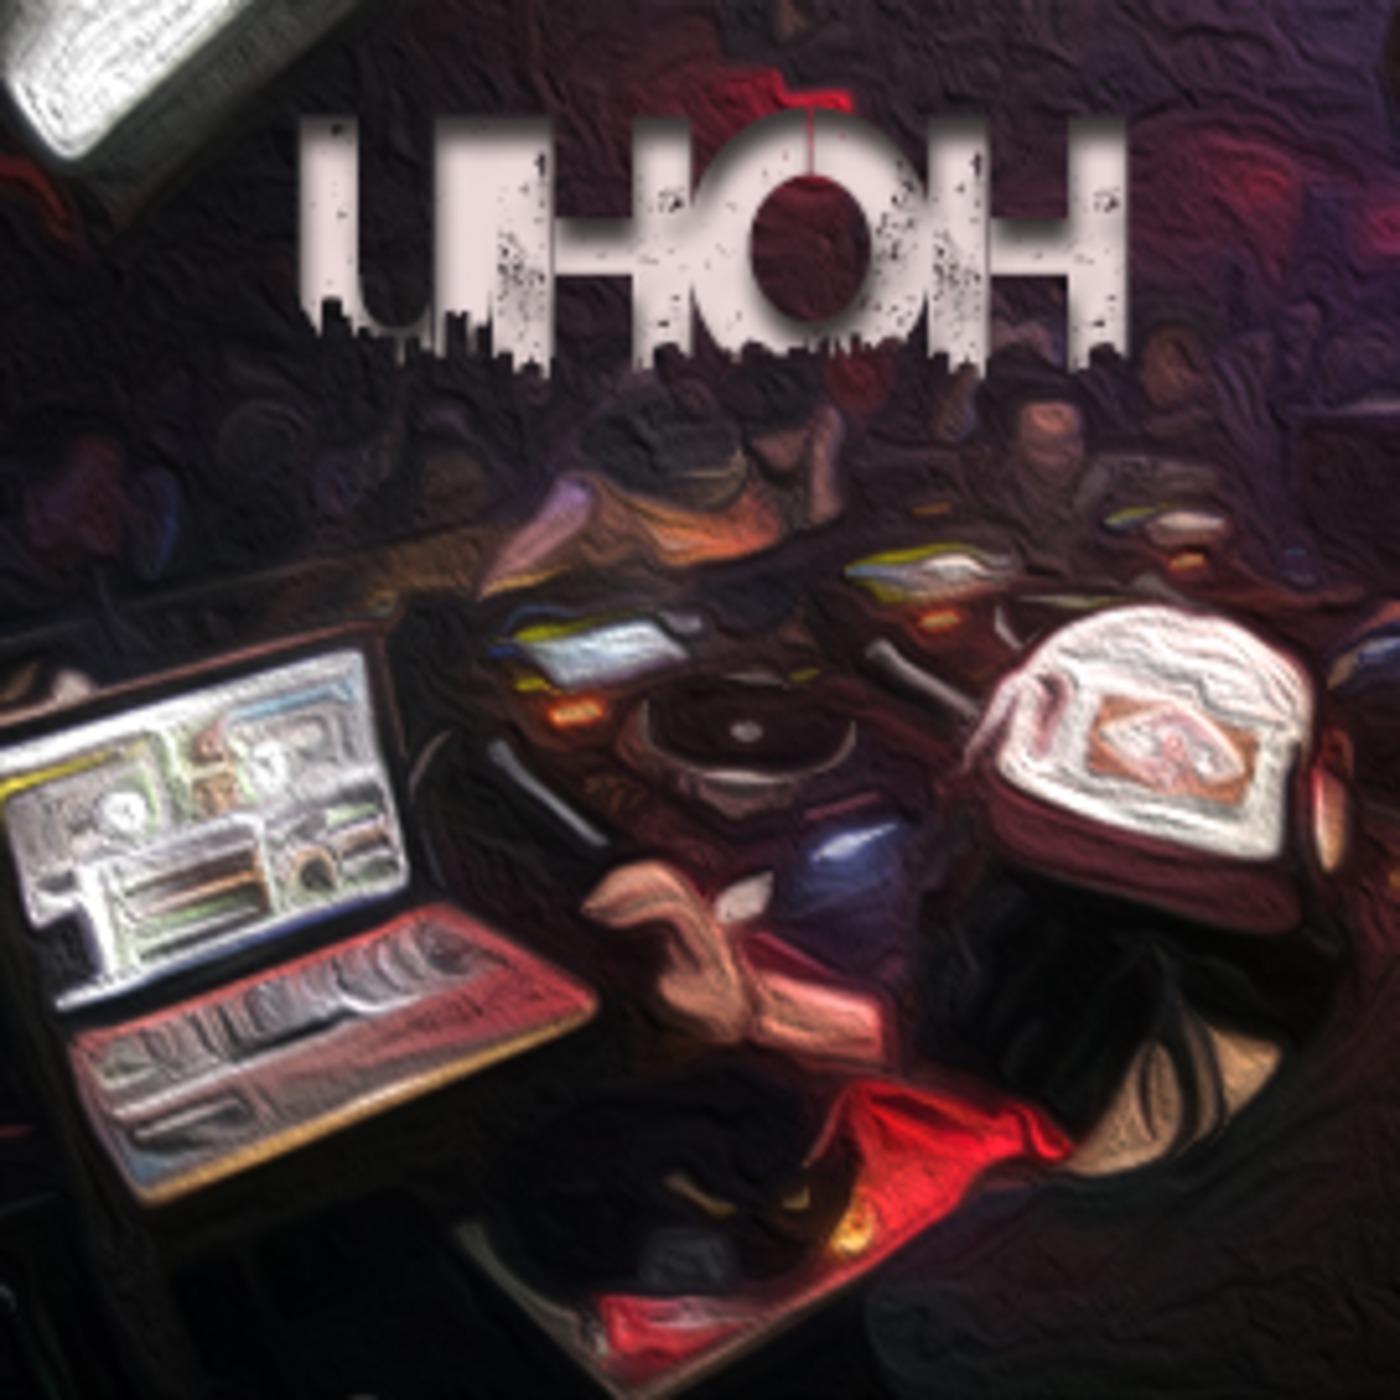 UhOh's Electronic Radio